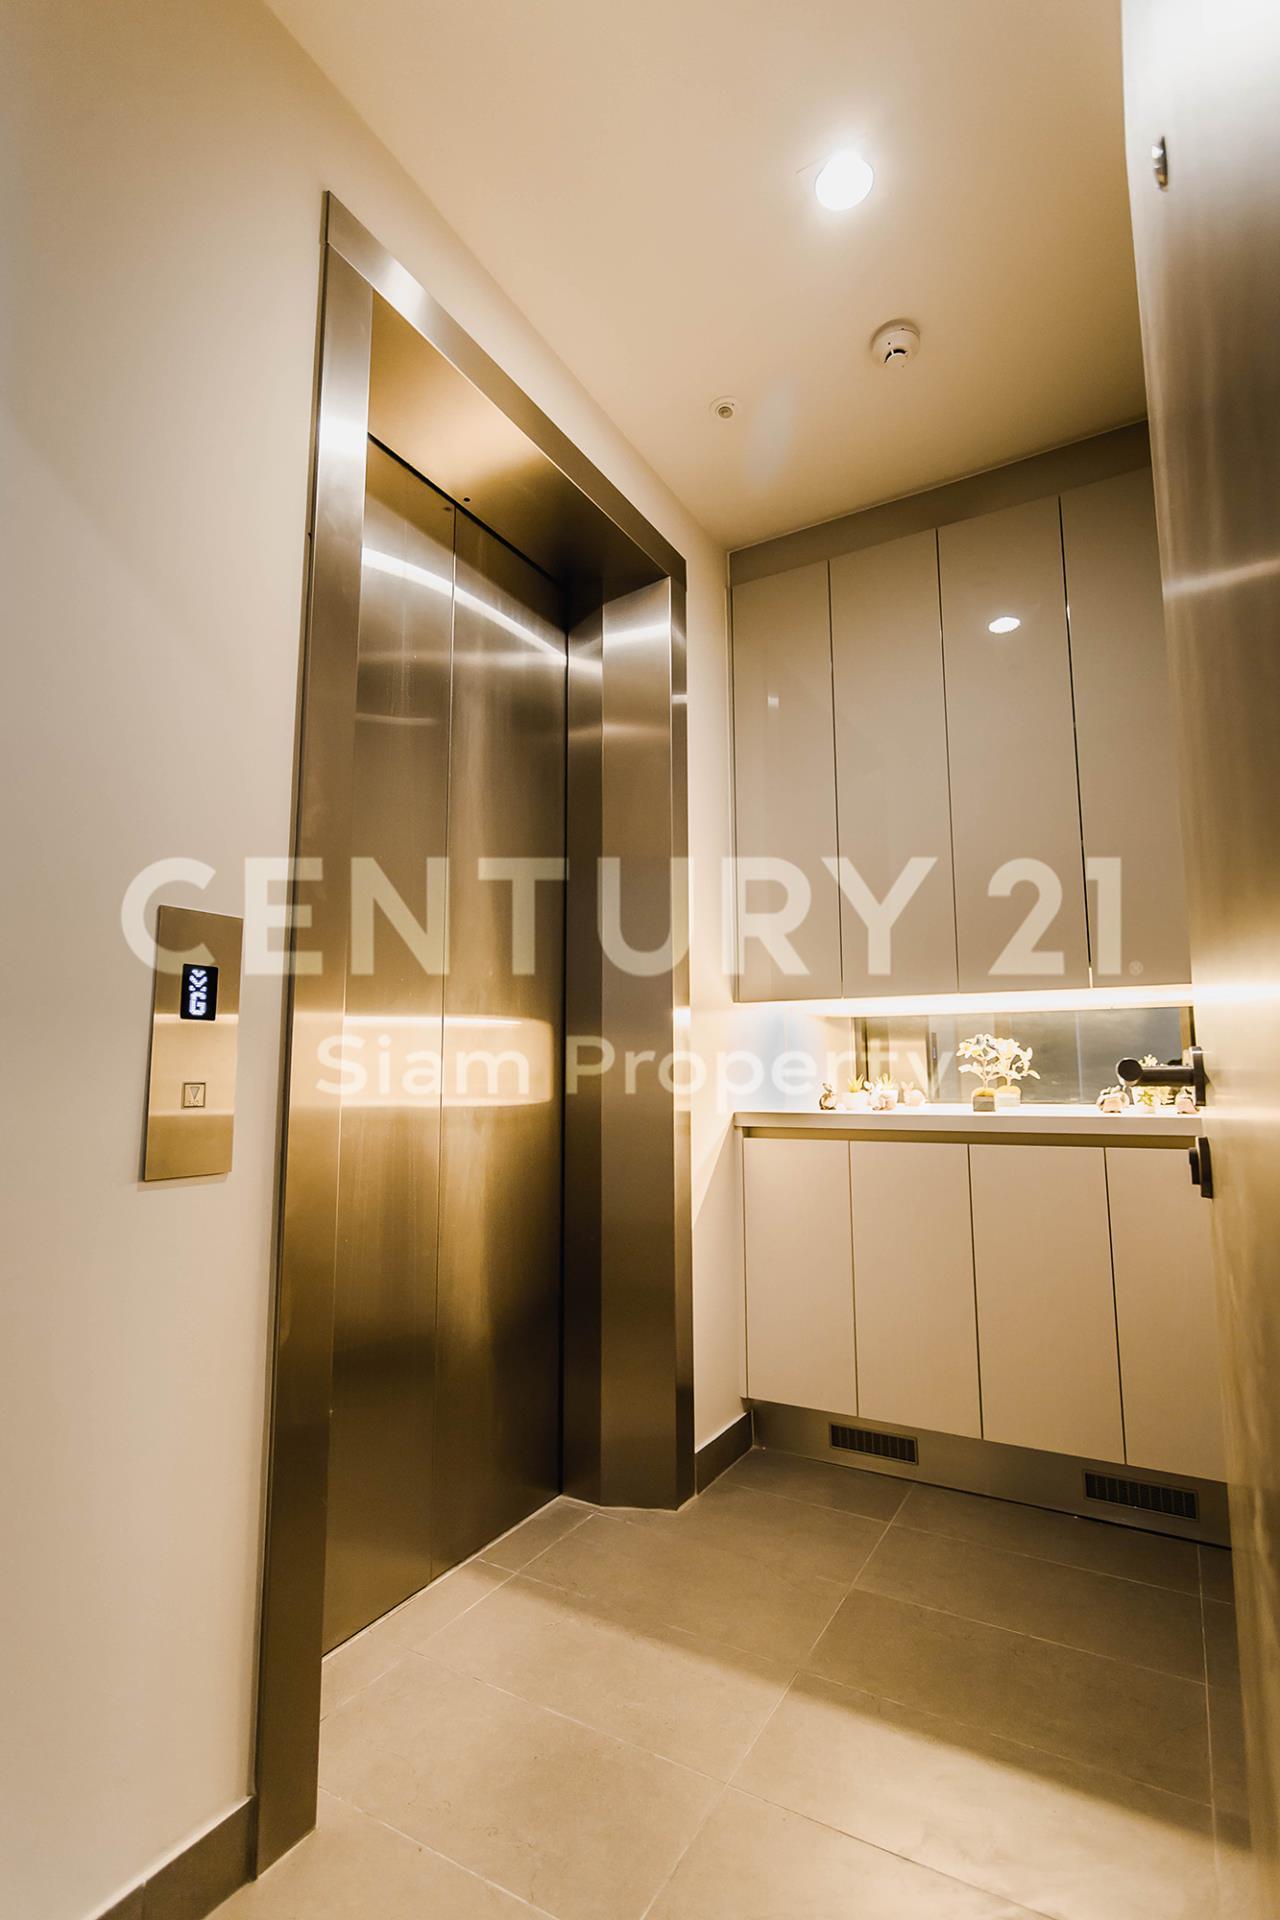 Century21 Siam Property Agency's Noble Ploenchit 9